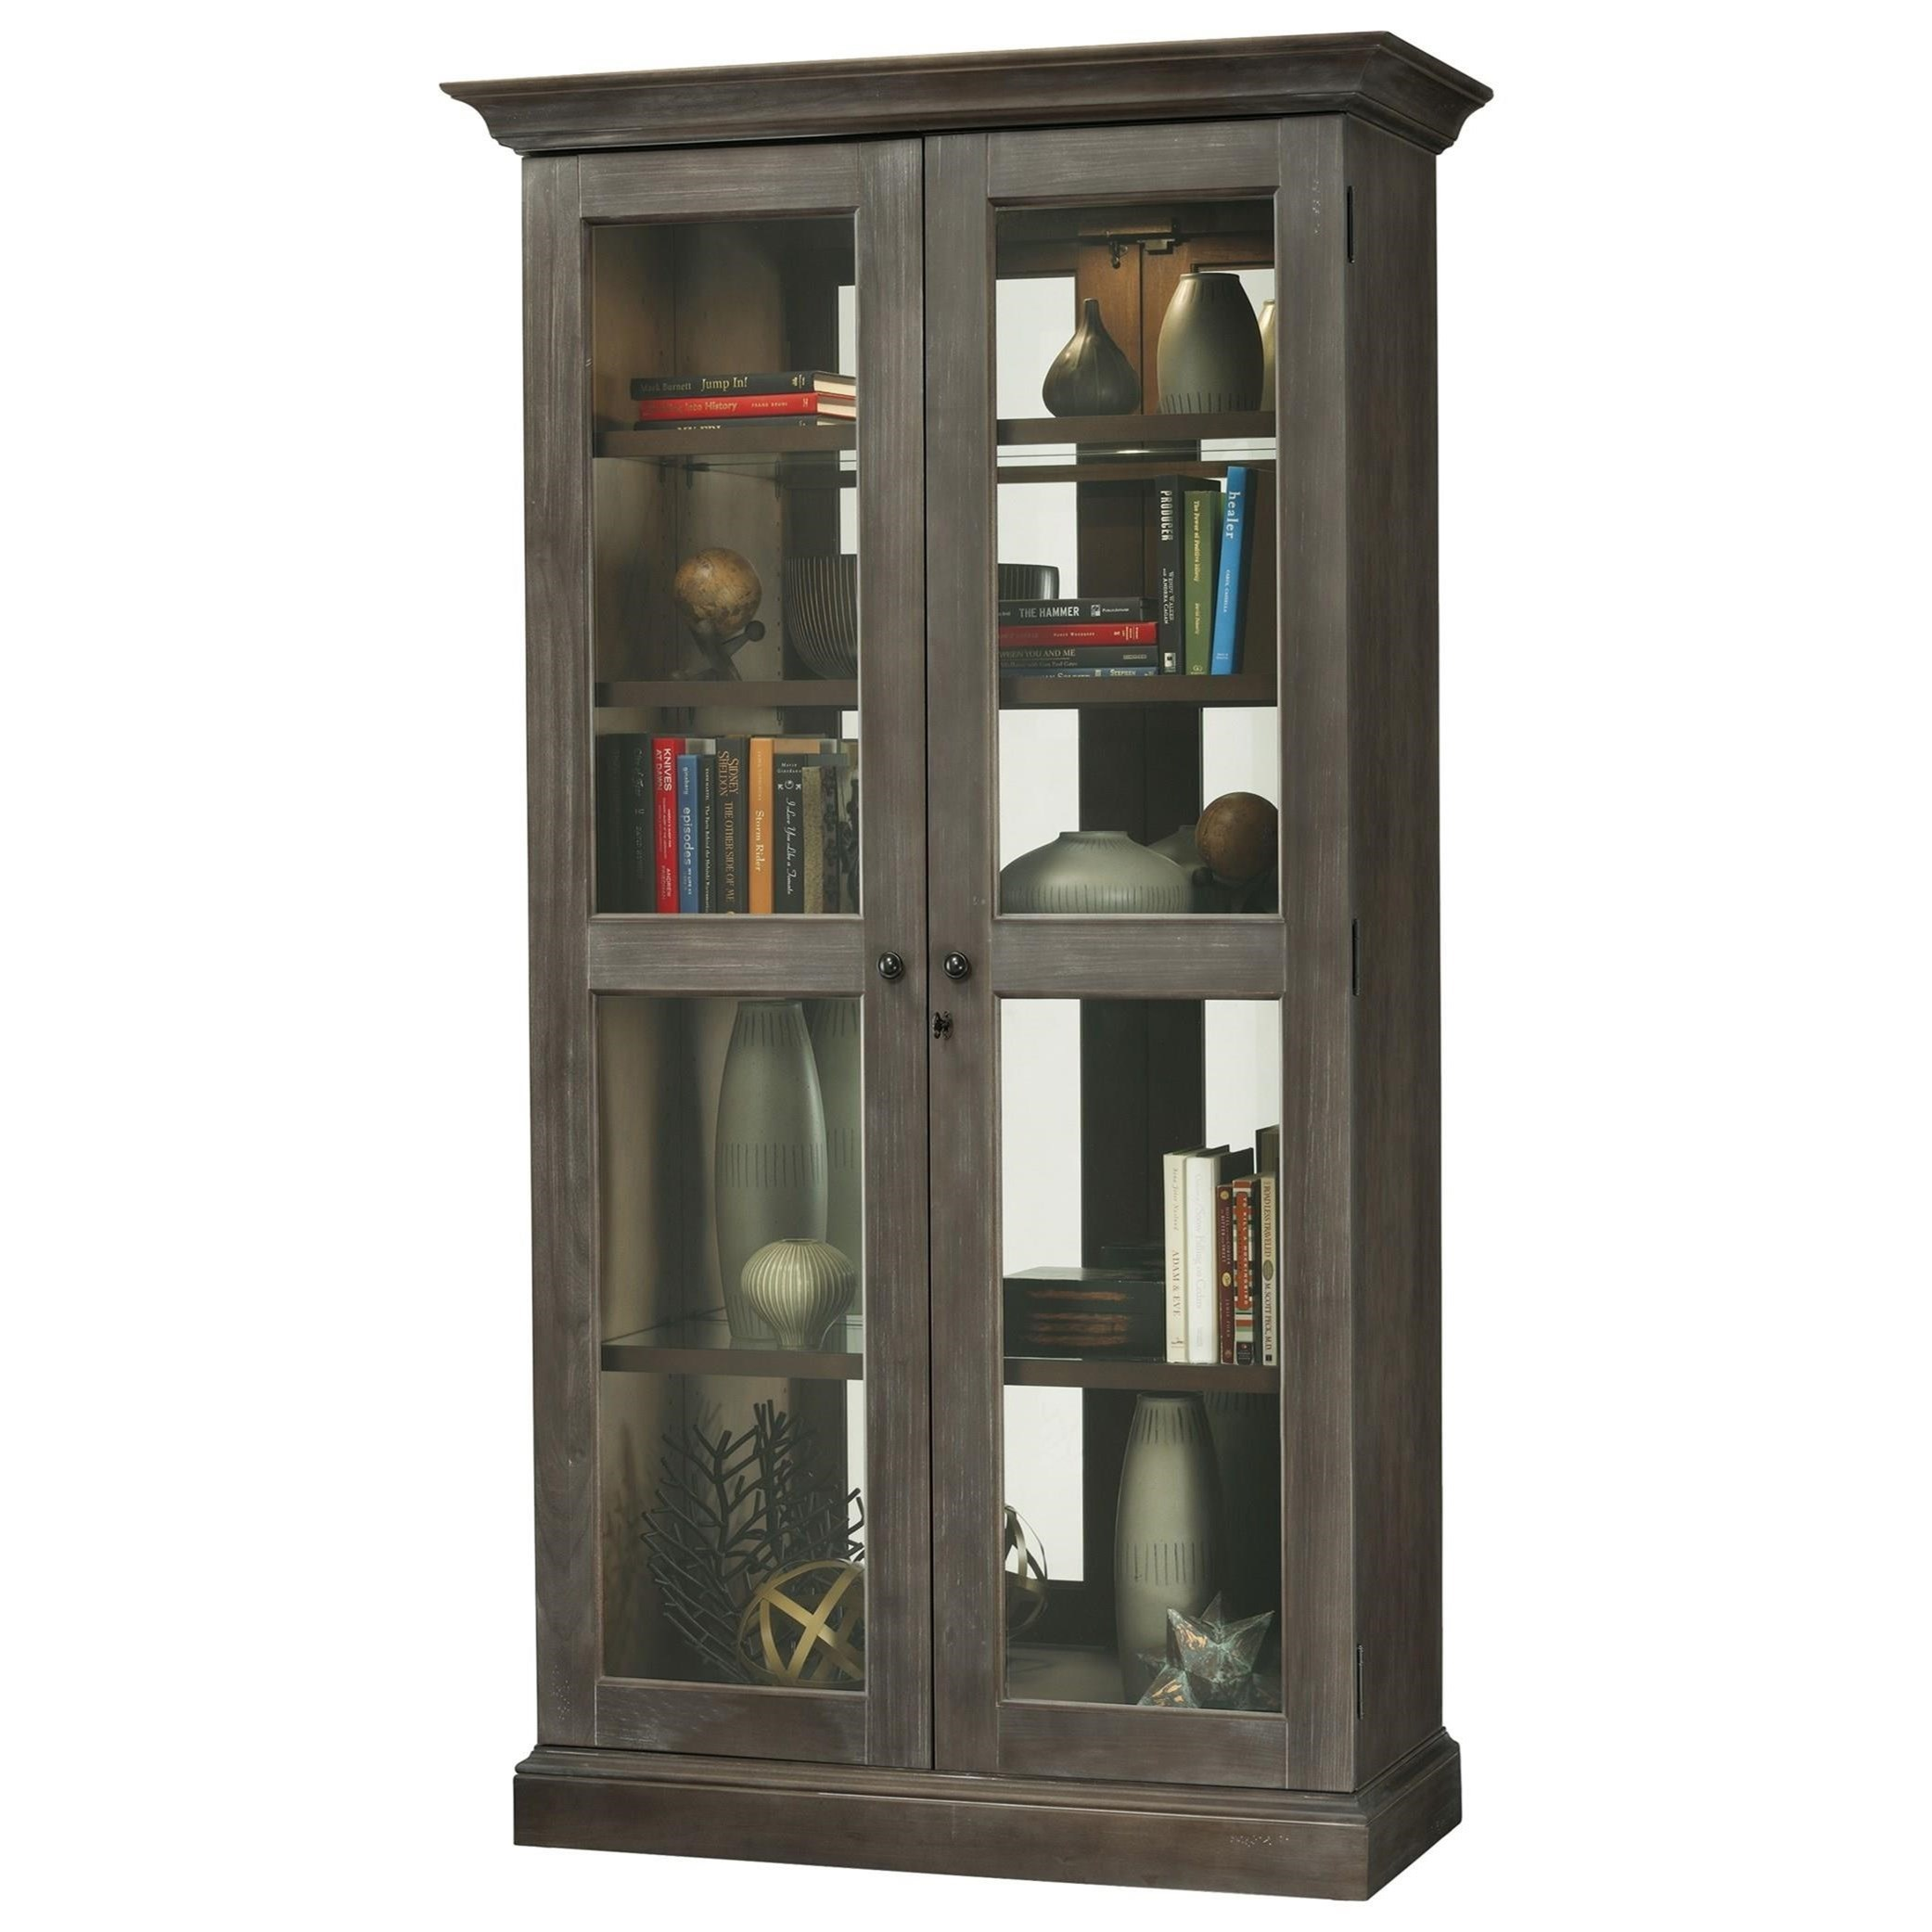 Howard Miller Cabinets Lennon III Bookcase | Wayside ...